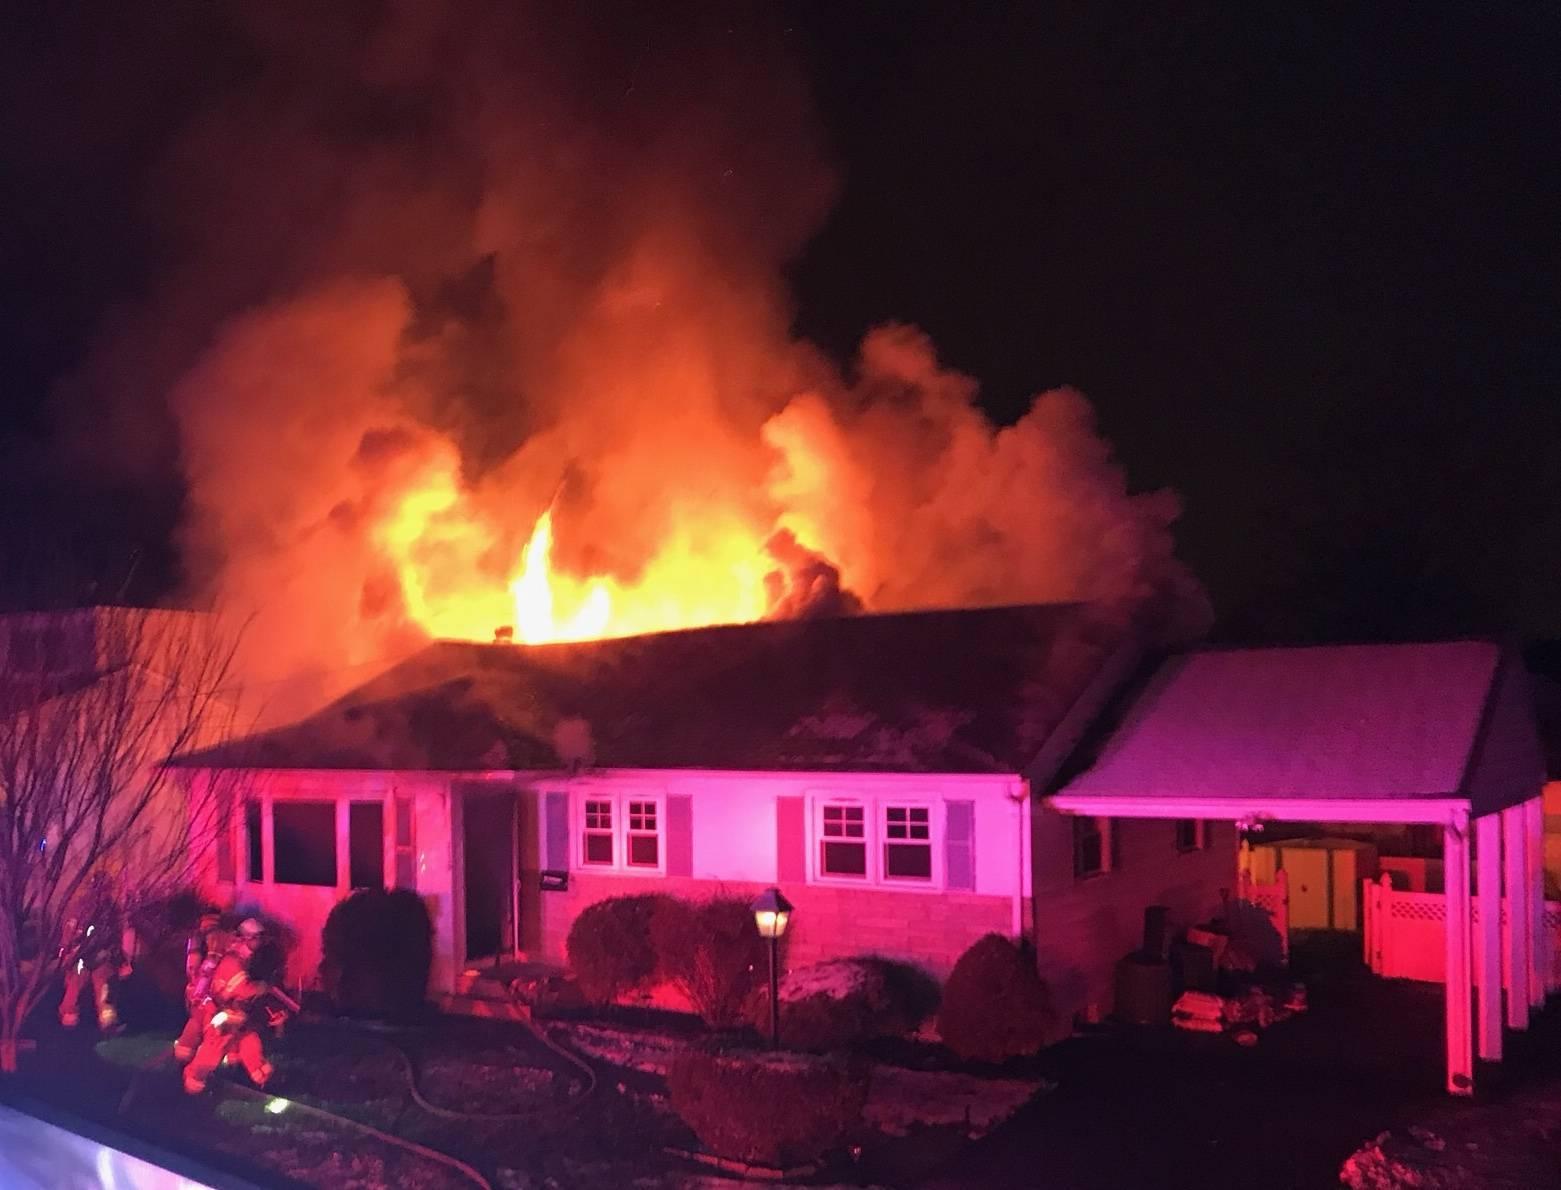 3afae7fd6761db2efe55_Oxford_House_Fire1.jpg